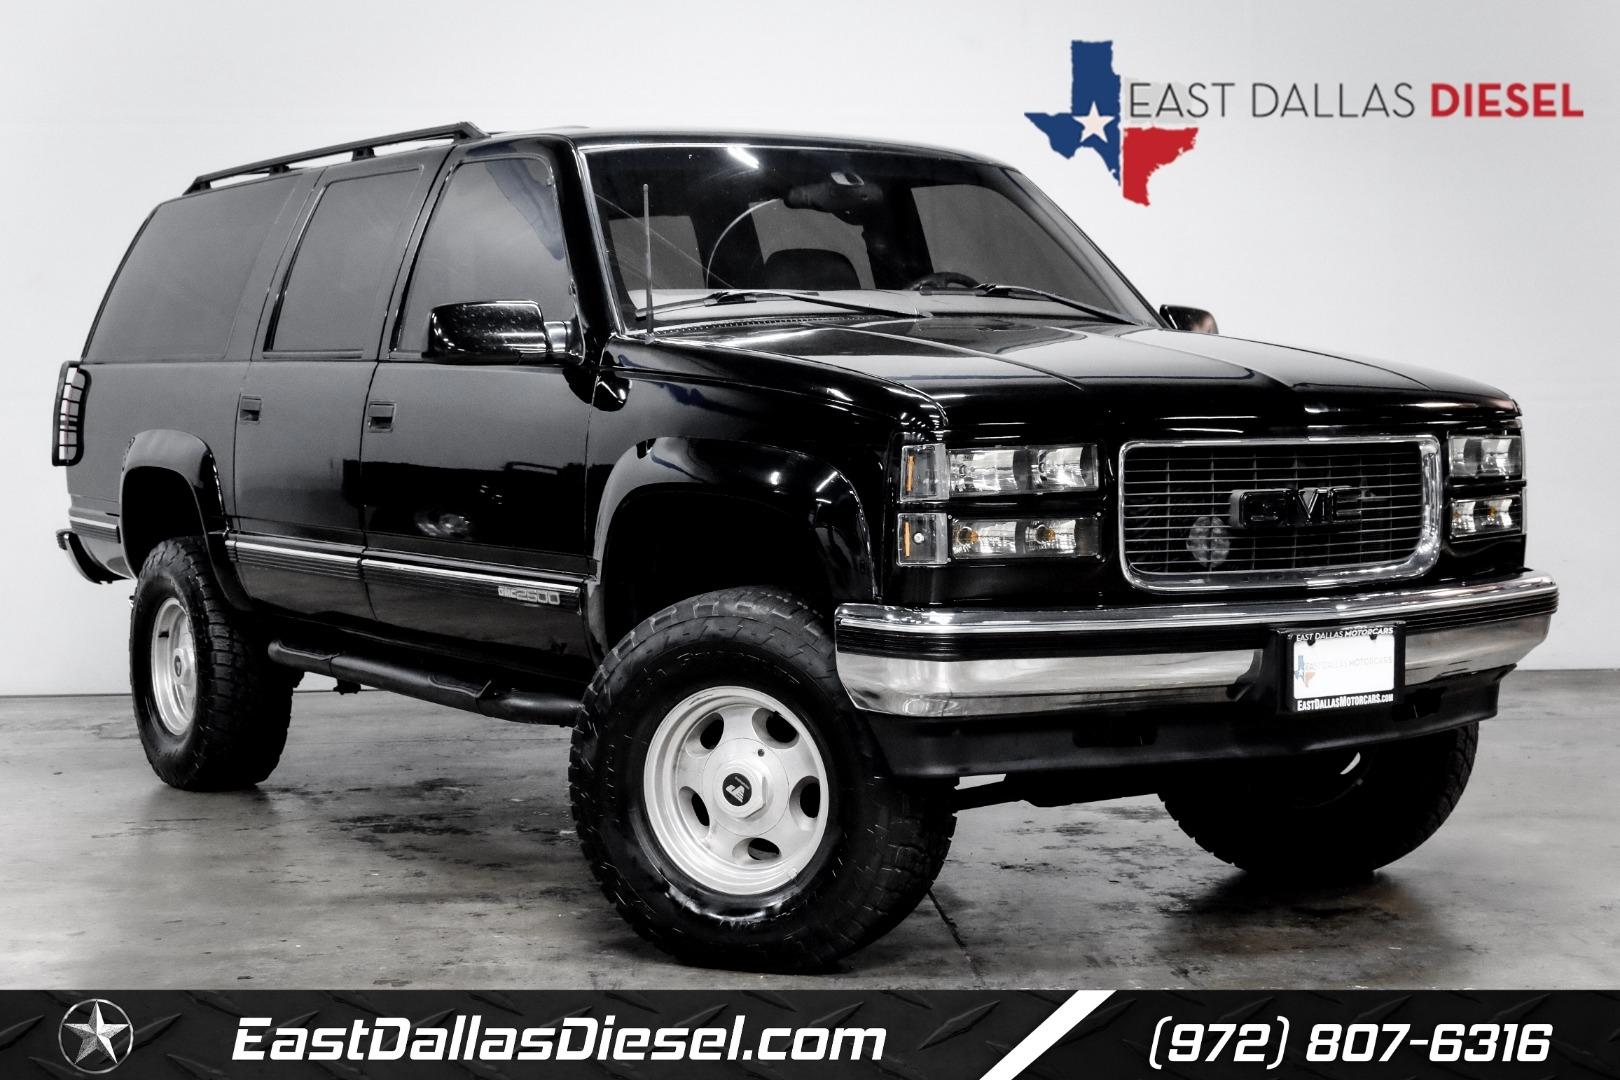 1 Owner Rare 2500 Slt Pkg 7 4l V8 Auto 4wd Leather 3rd Row Lifted Custom Wheels Tx Truck East Dallas Diesel Dealership In Dallas